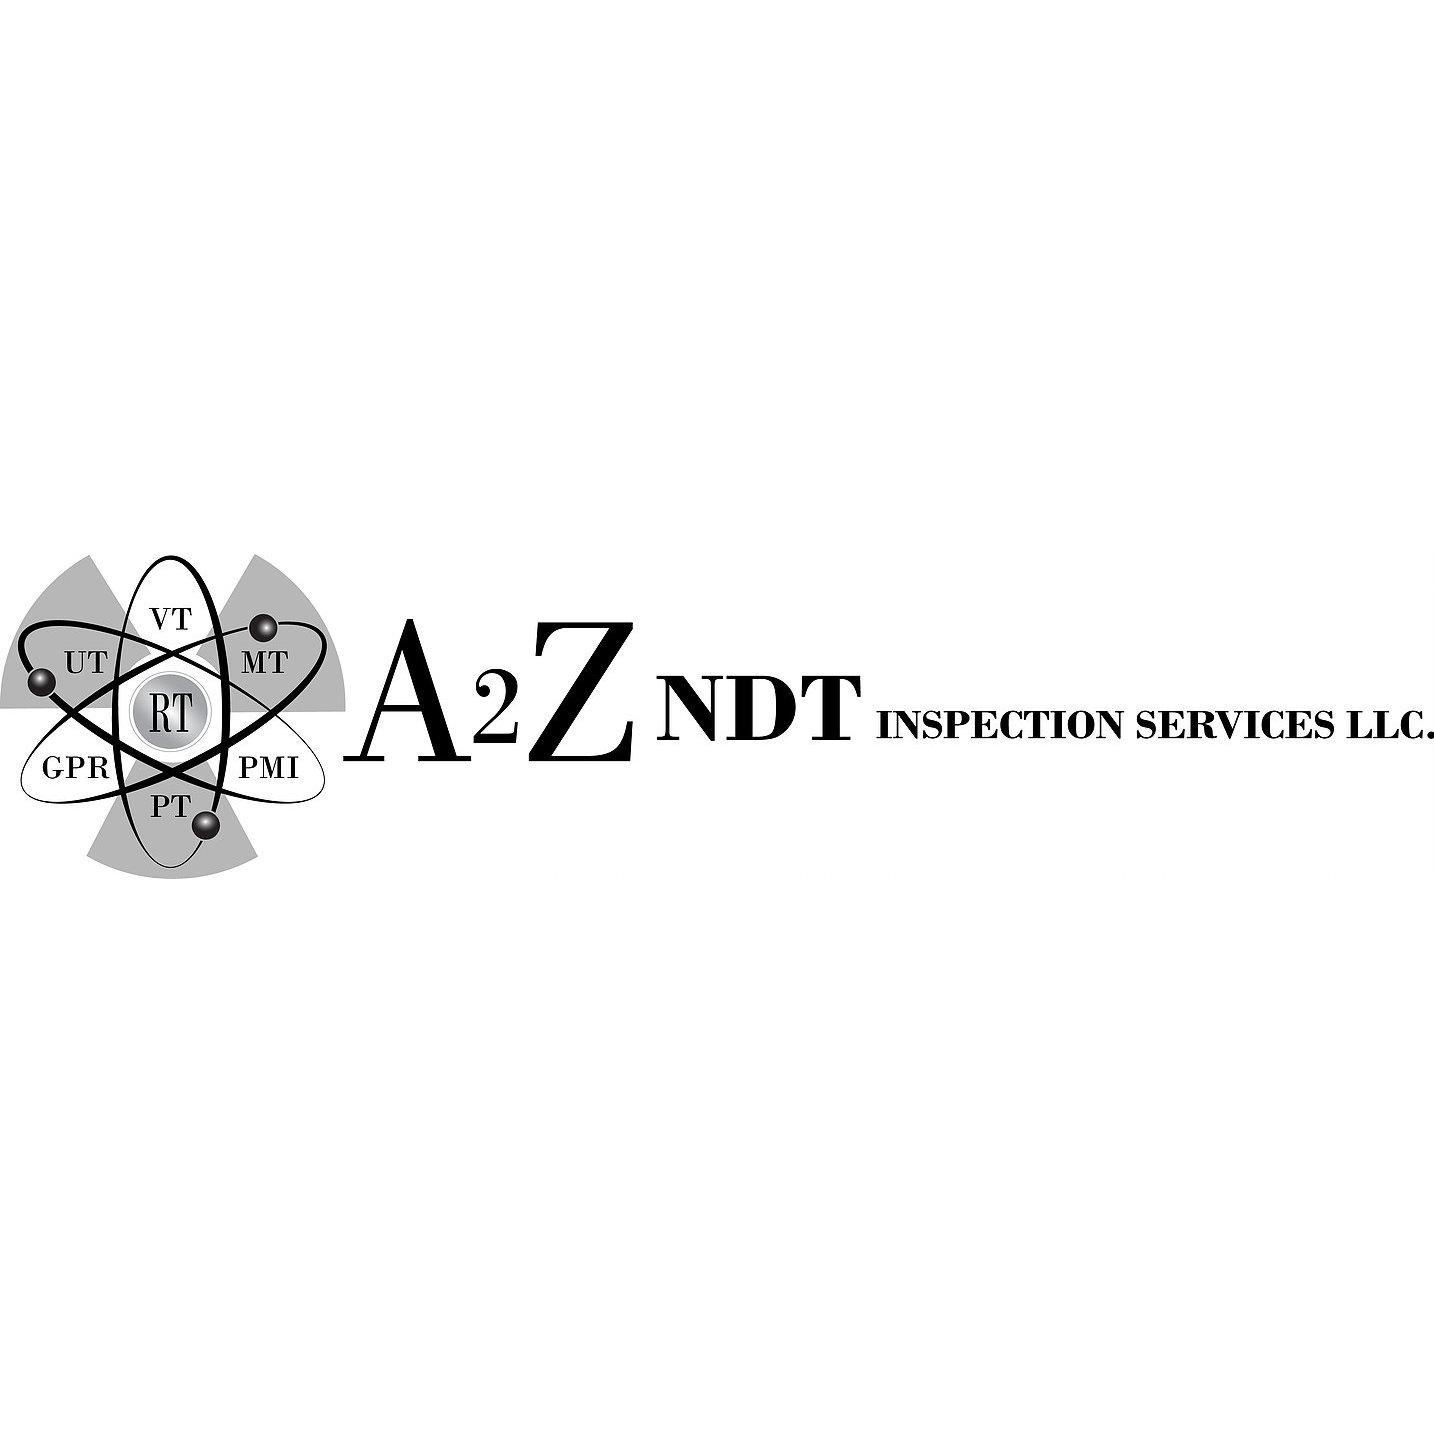 A2ZNDT Inspection Services LLC